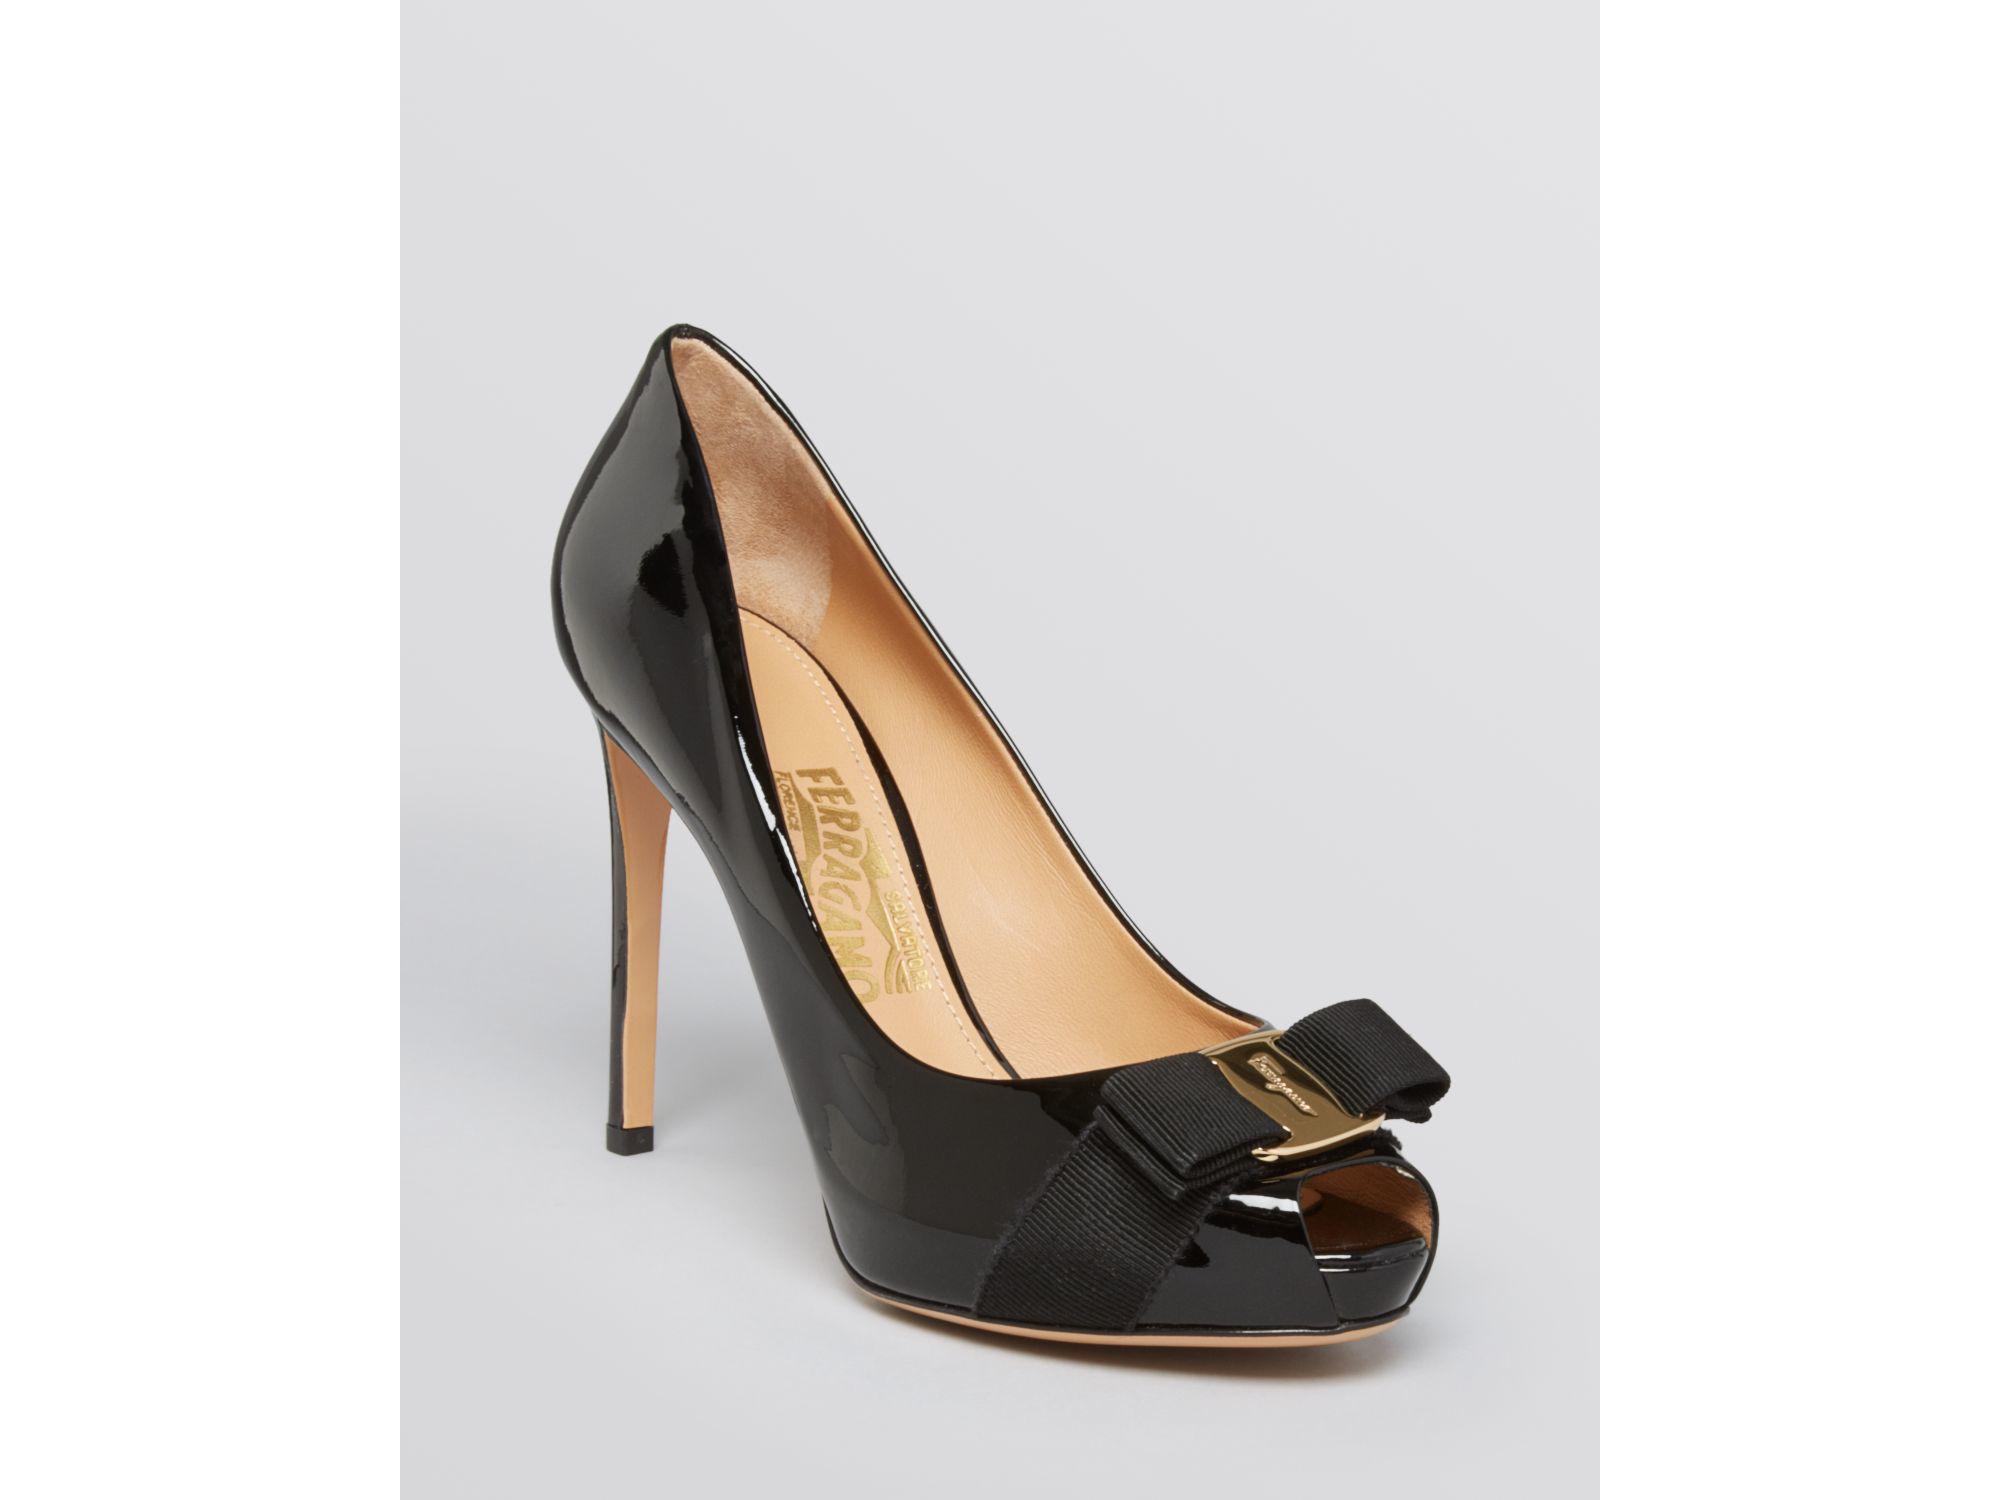 Lyst Ferragamo Peep Toe Platform Pumps Plum High Heel In Black Womens Pu Sweet Heels Shoes Gallery